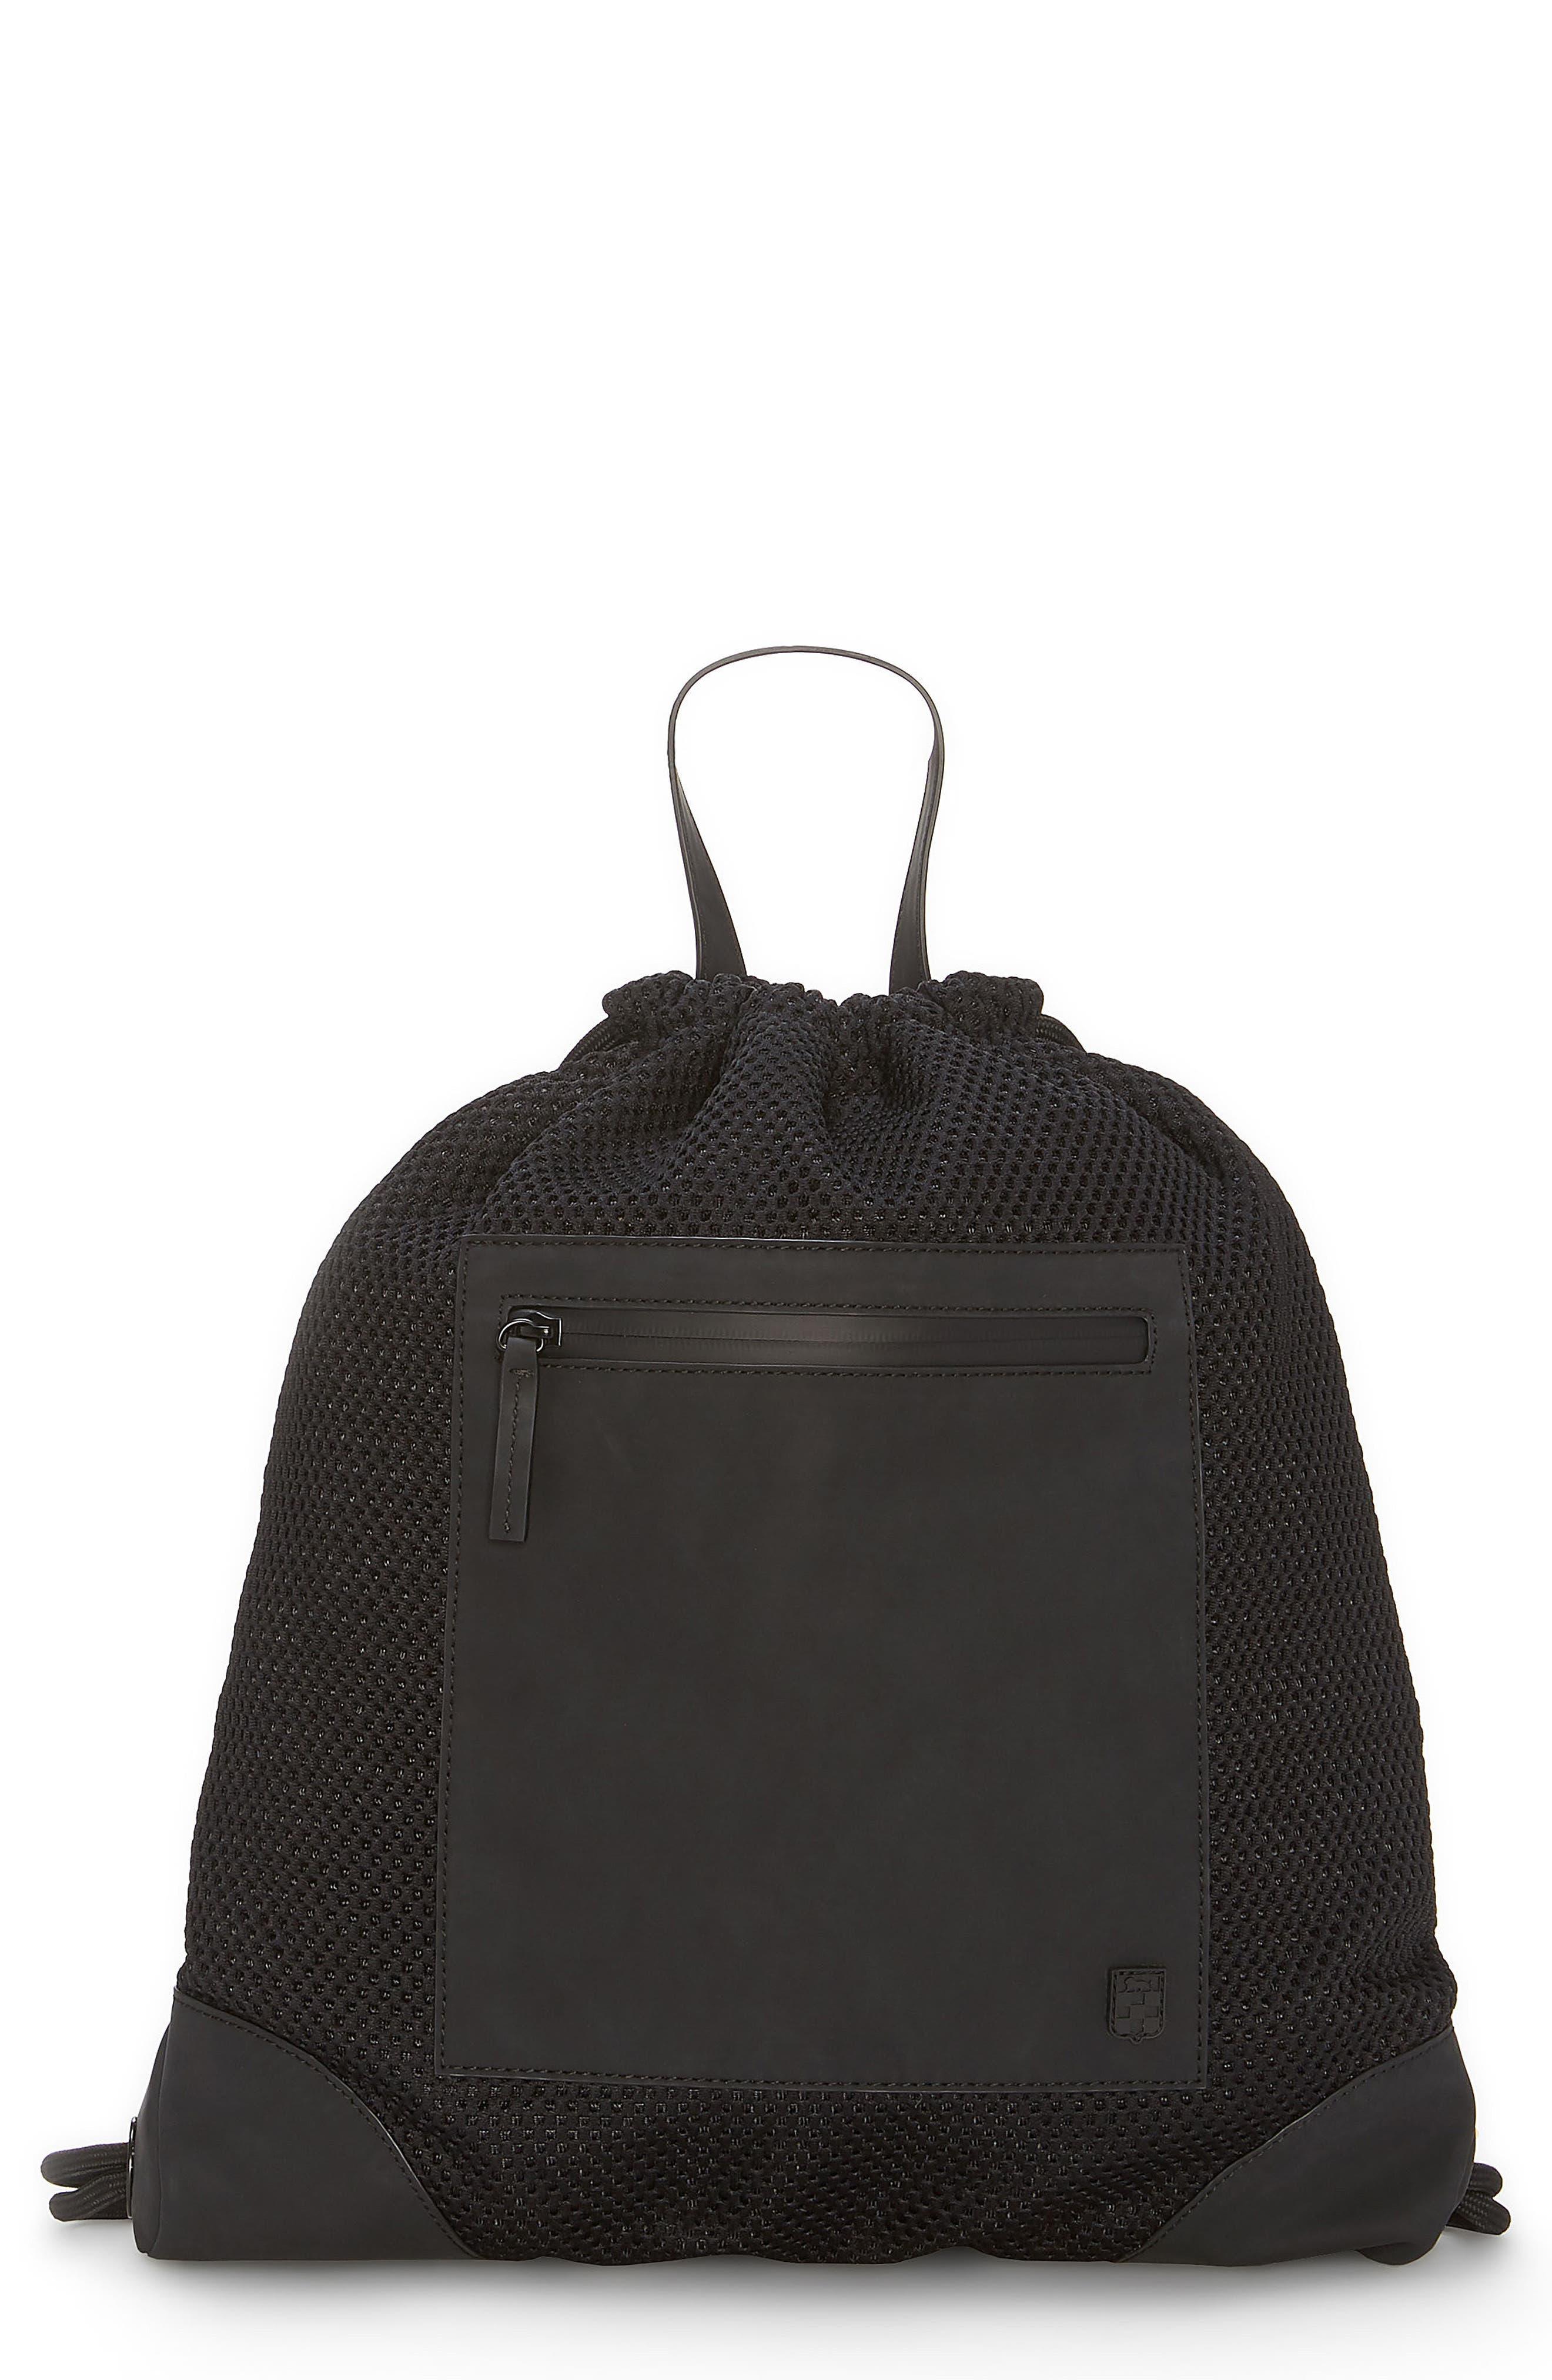 Urban Mesh Backpack,                             Main thumbnail 1, color,                             Black